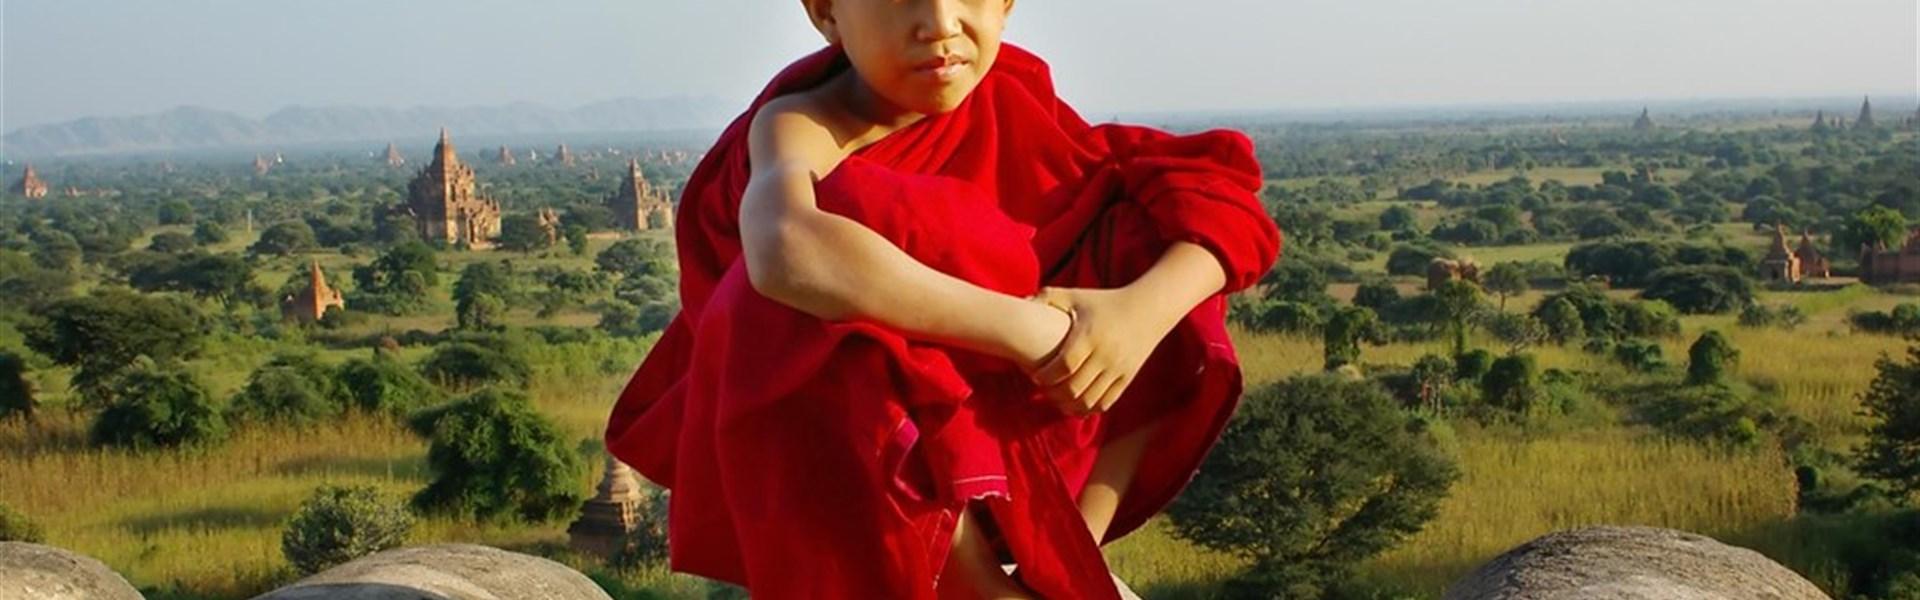 Okruh - To nejlepší z Barmy